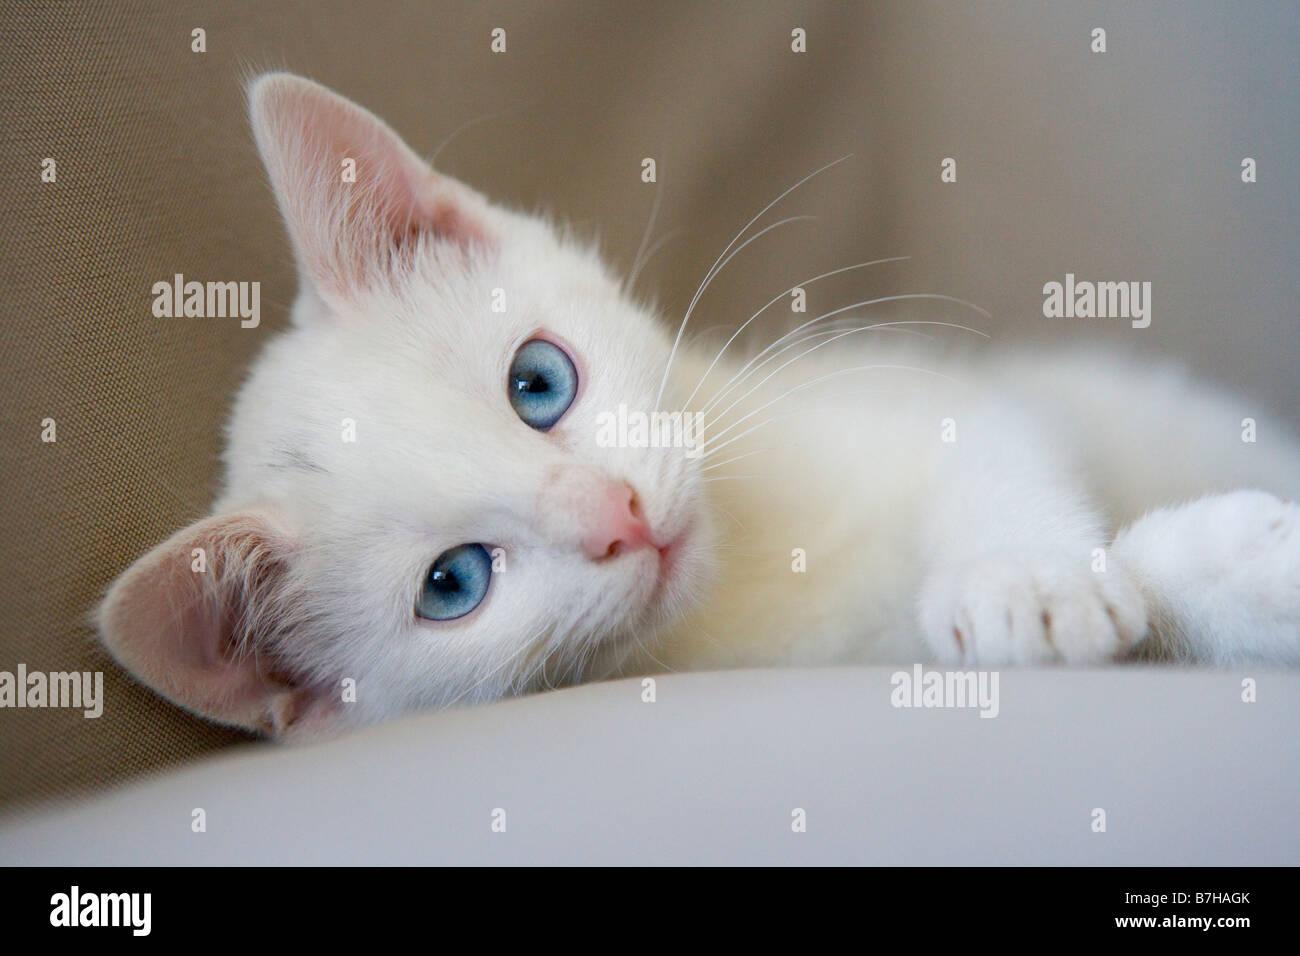 White kitten with blue eyes - Stock Image